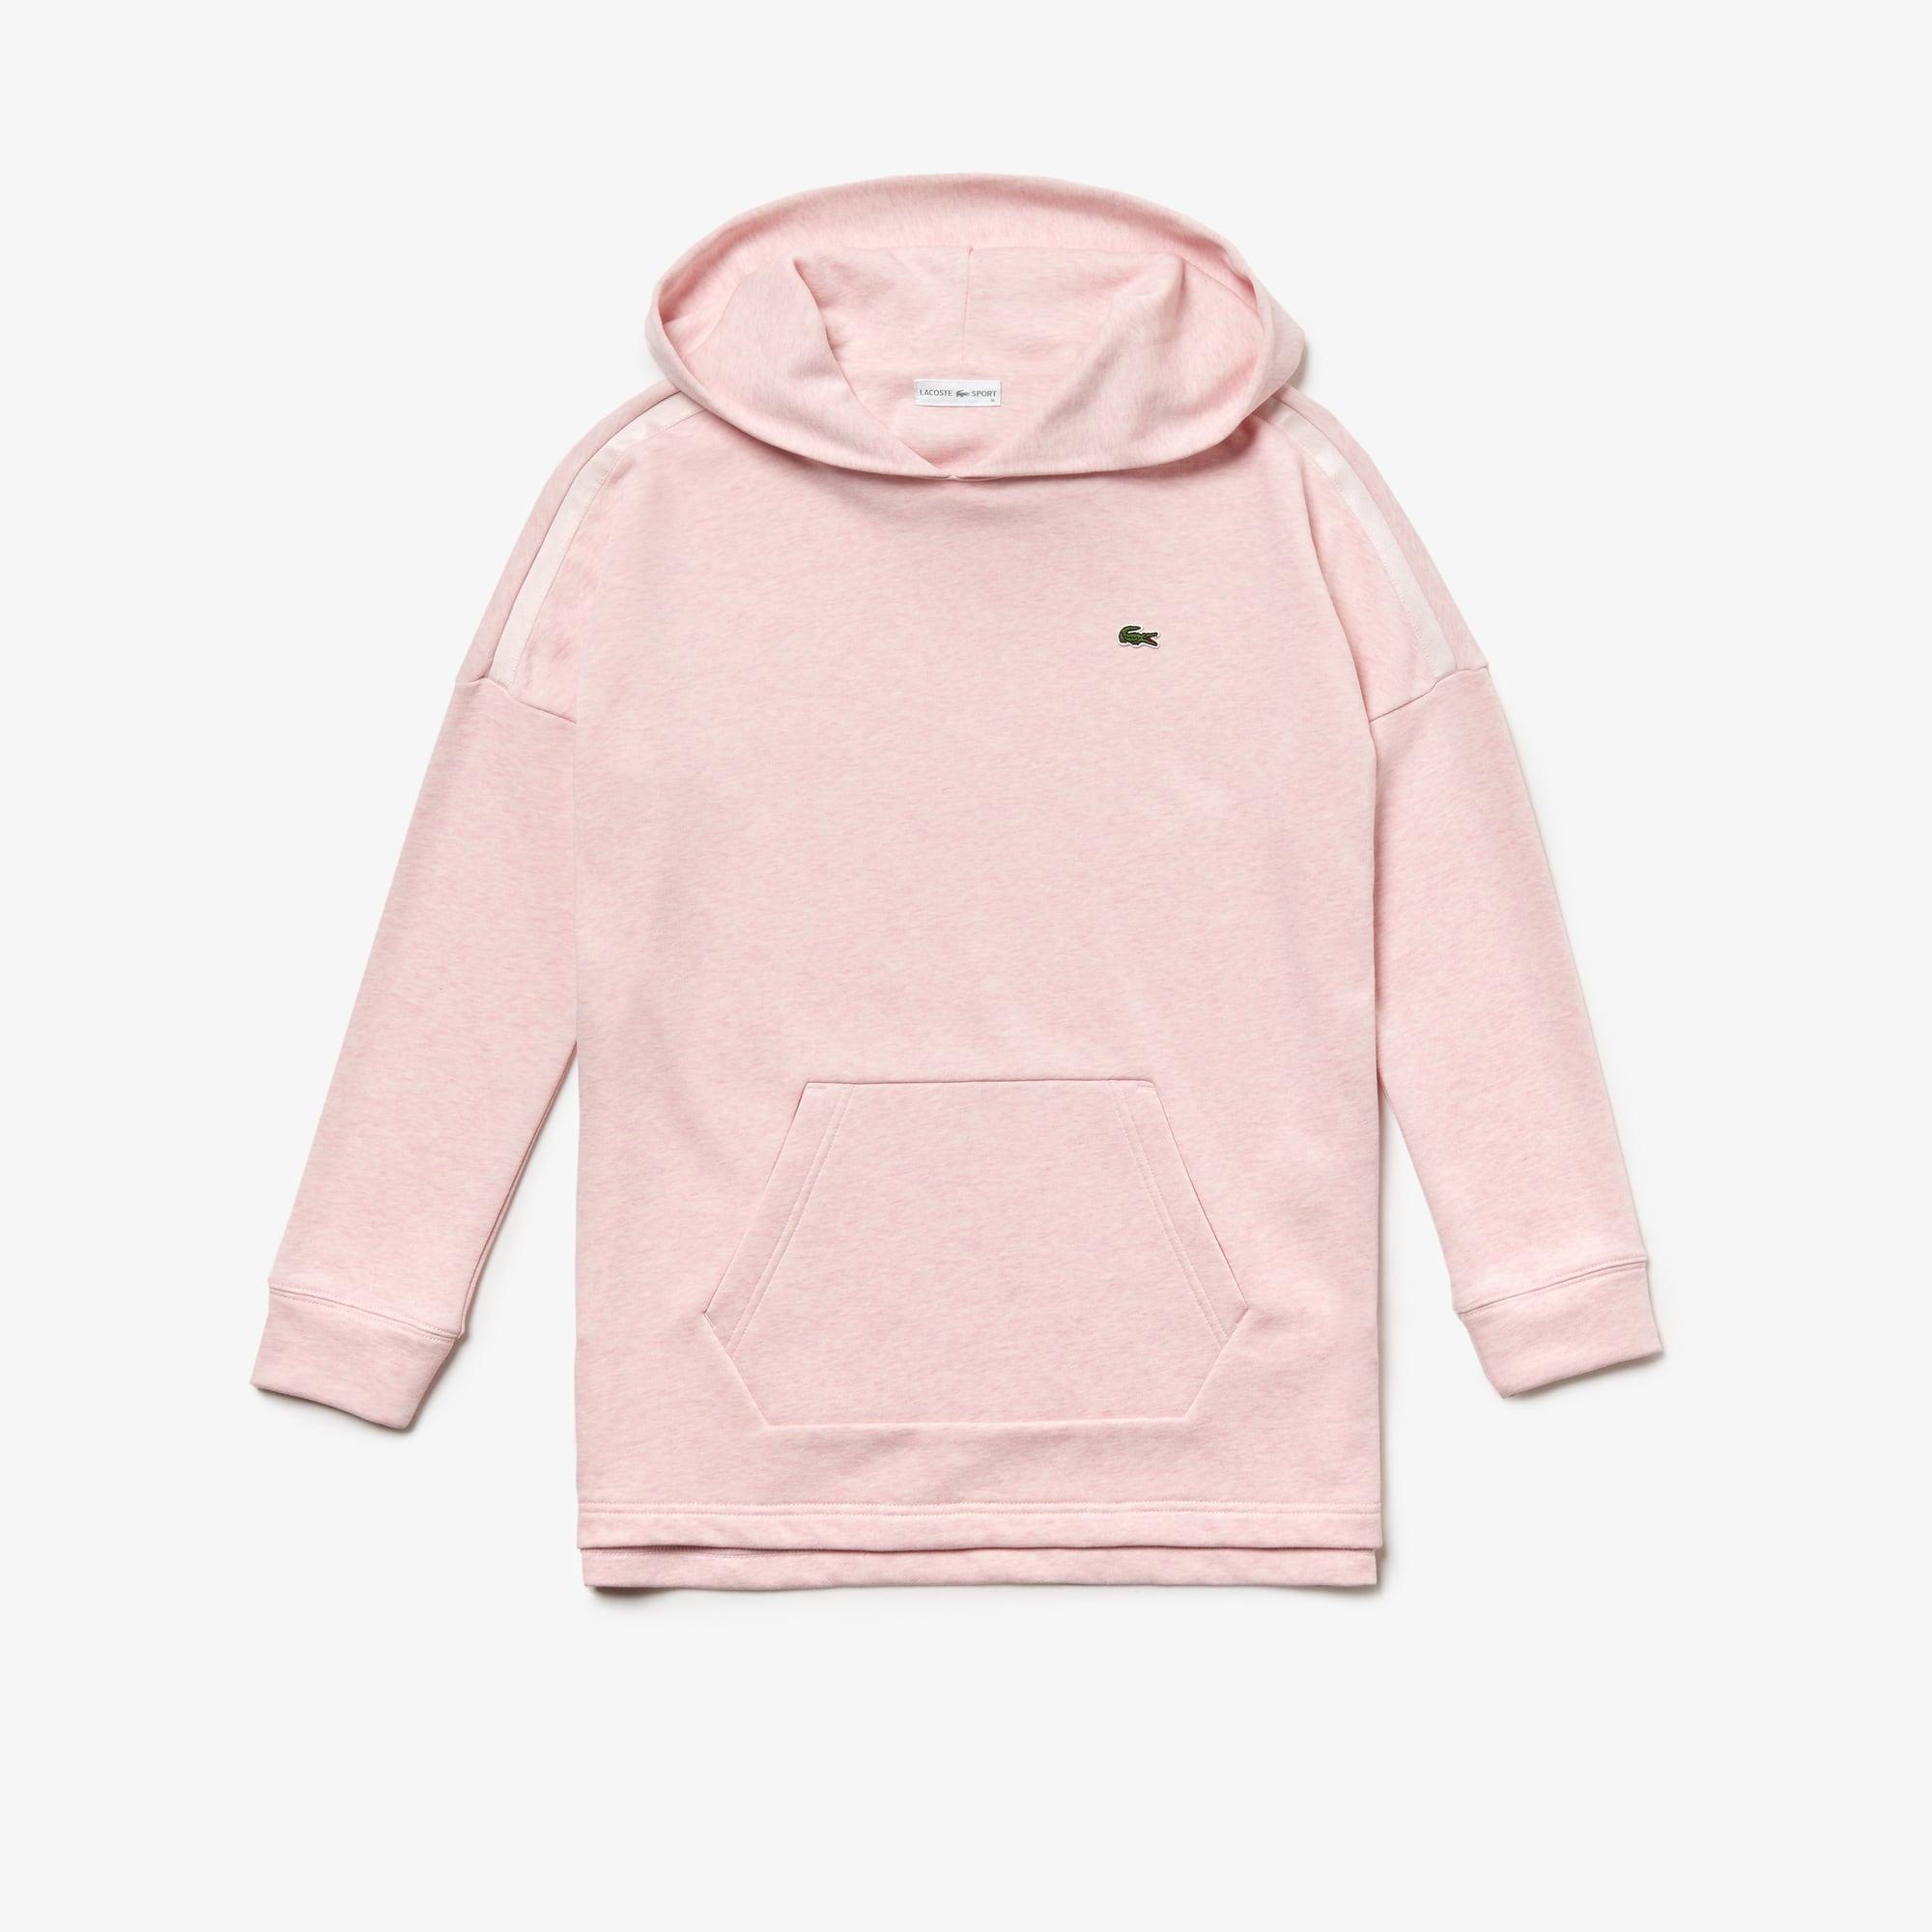 Women's SPORT Hooded Fleece Tennis Sweatshirt